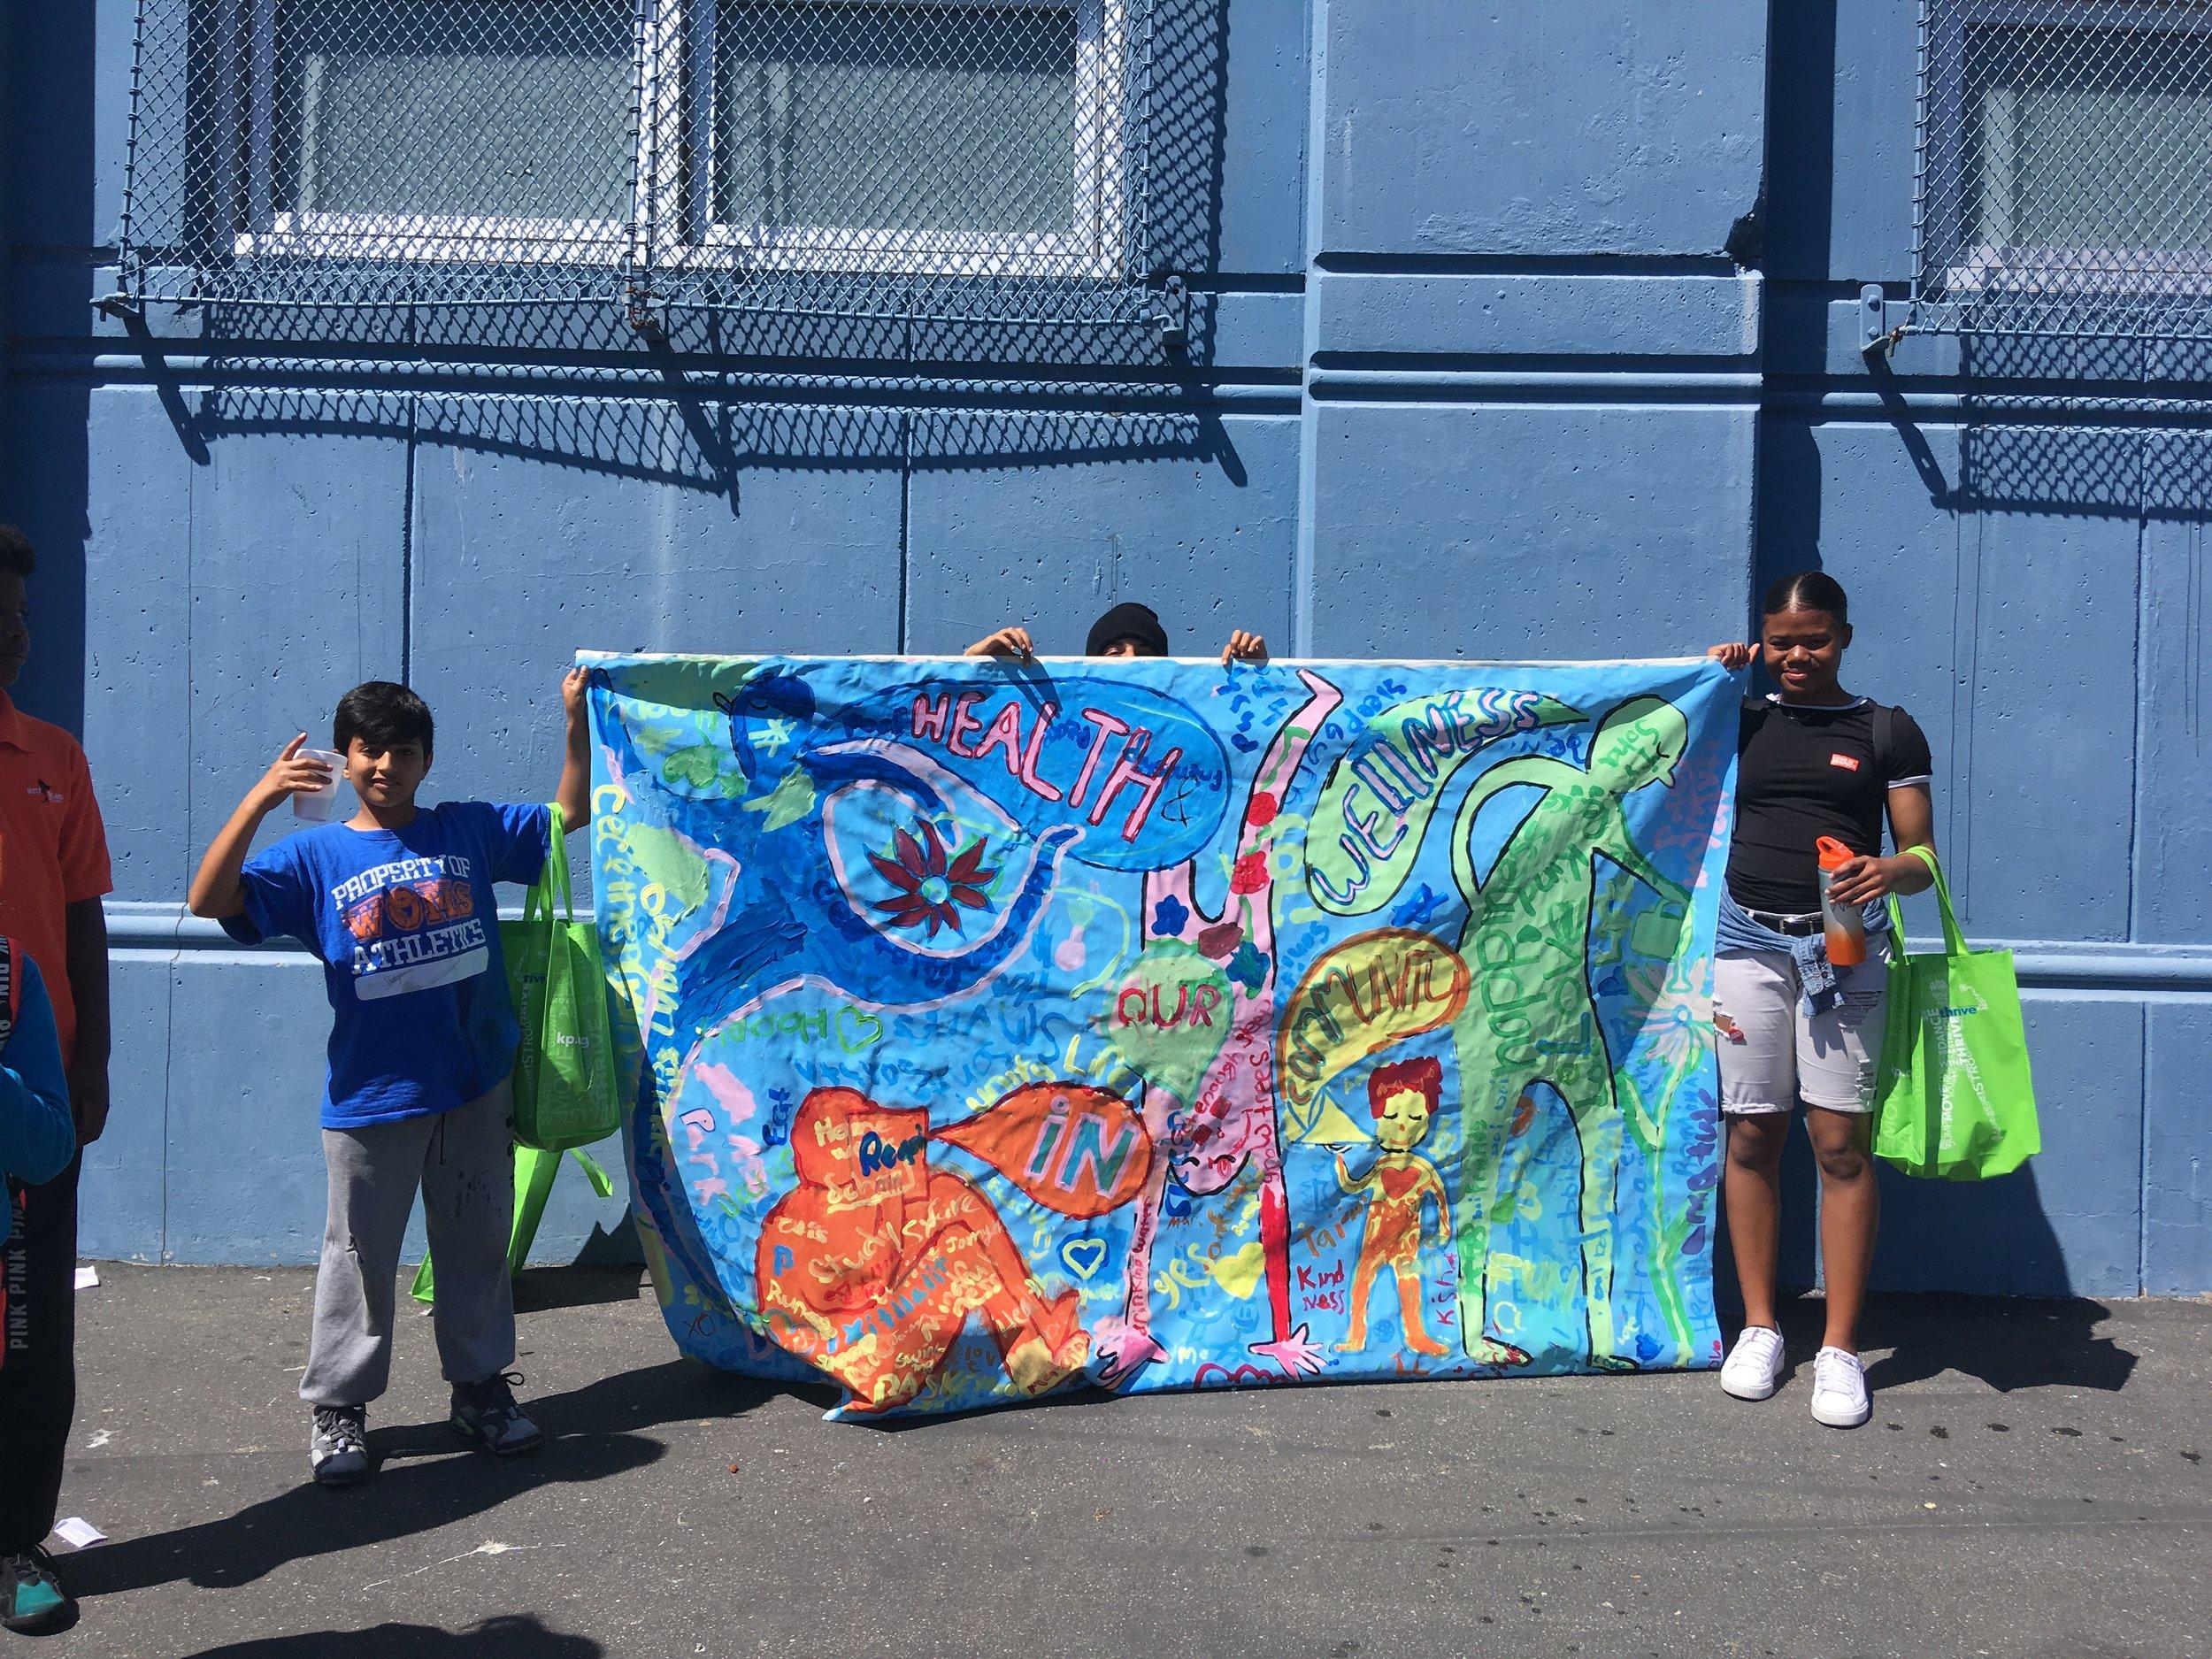 Heath & Wellness Mural at West Oakland Middle School